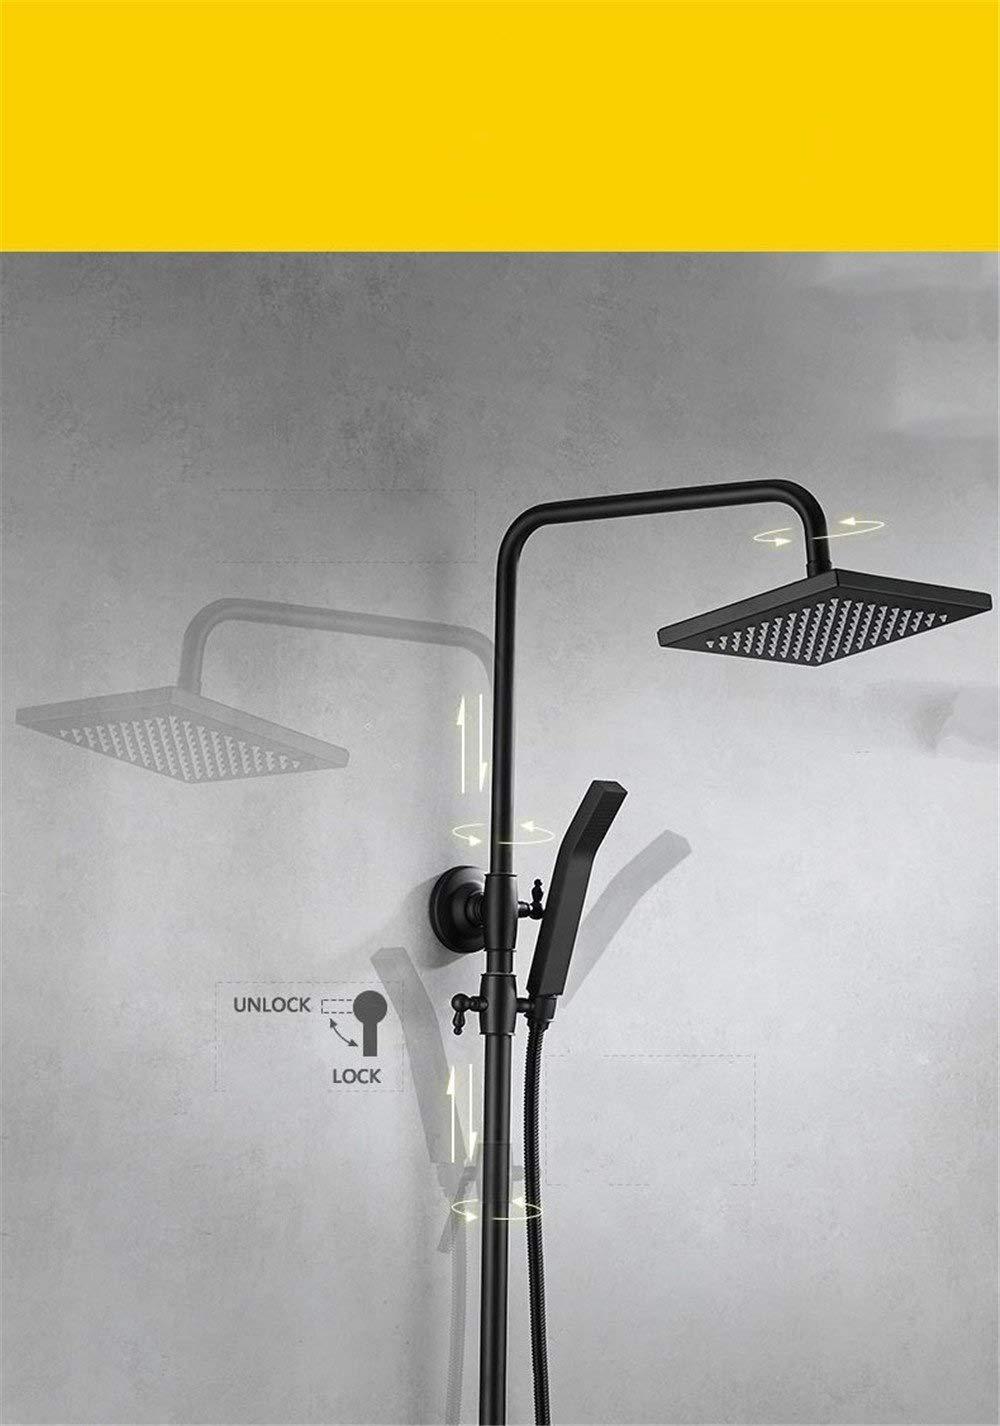 CYHY Faucet Baño Cascada Mezclador Grifo Fregadero The Copper Black Rainfall Tap Faucet Perpendicular a la Pared Montado en la Mano Hand Frosted Black Bathroom Shower Shower Grifos de lavabo